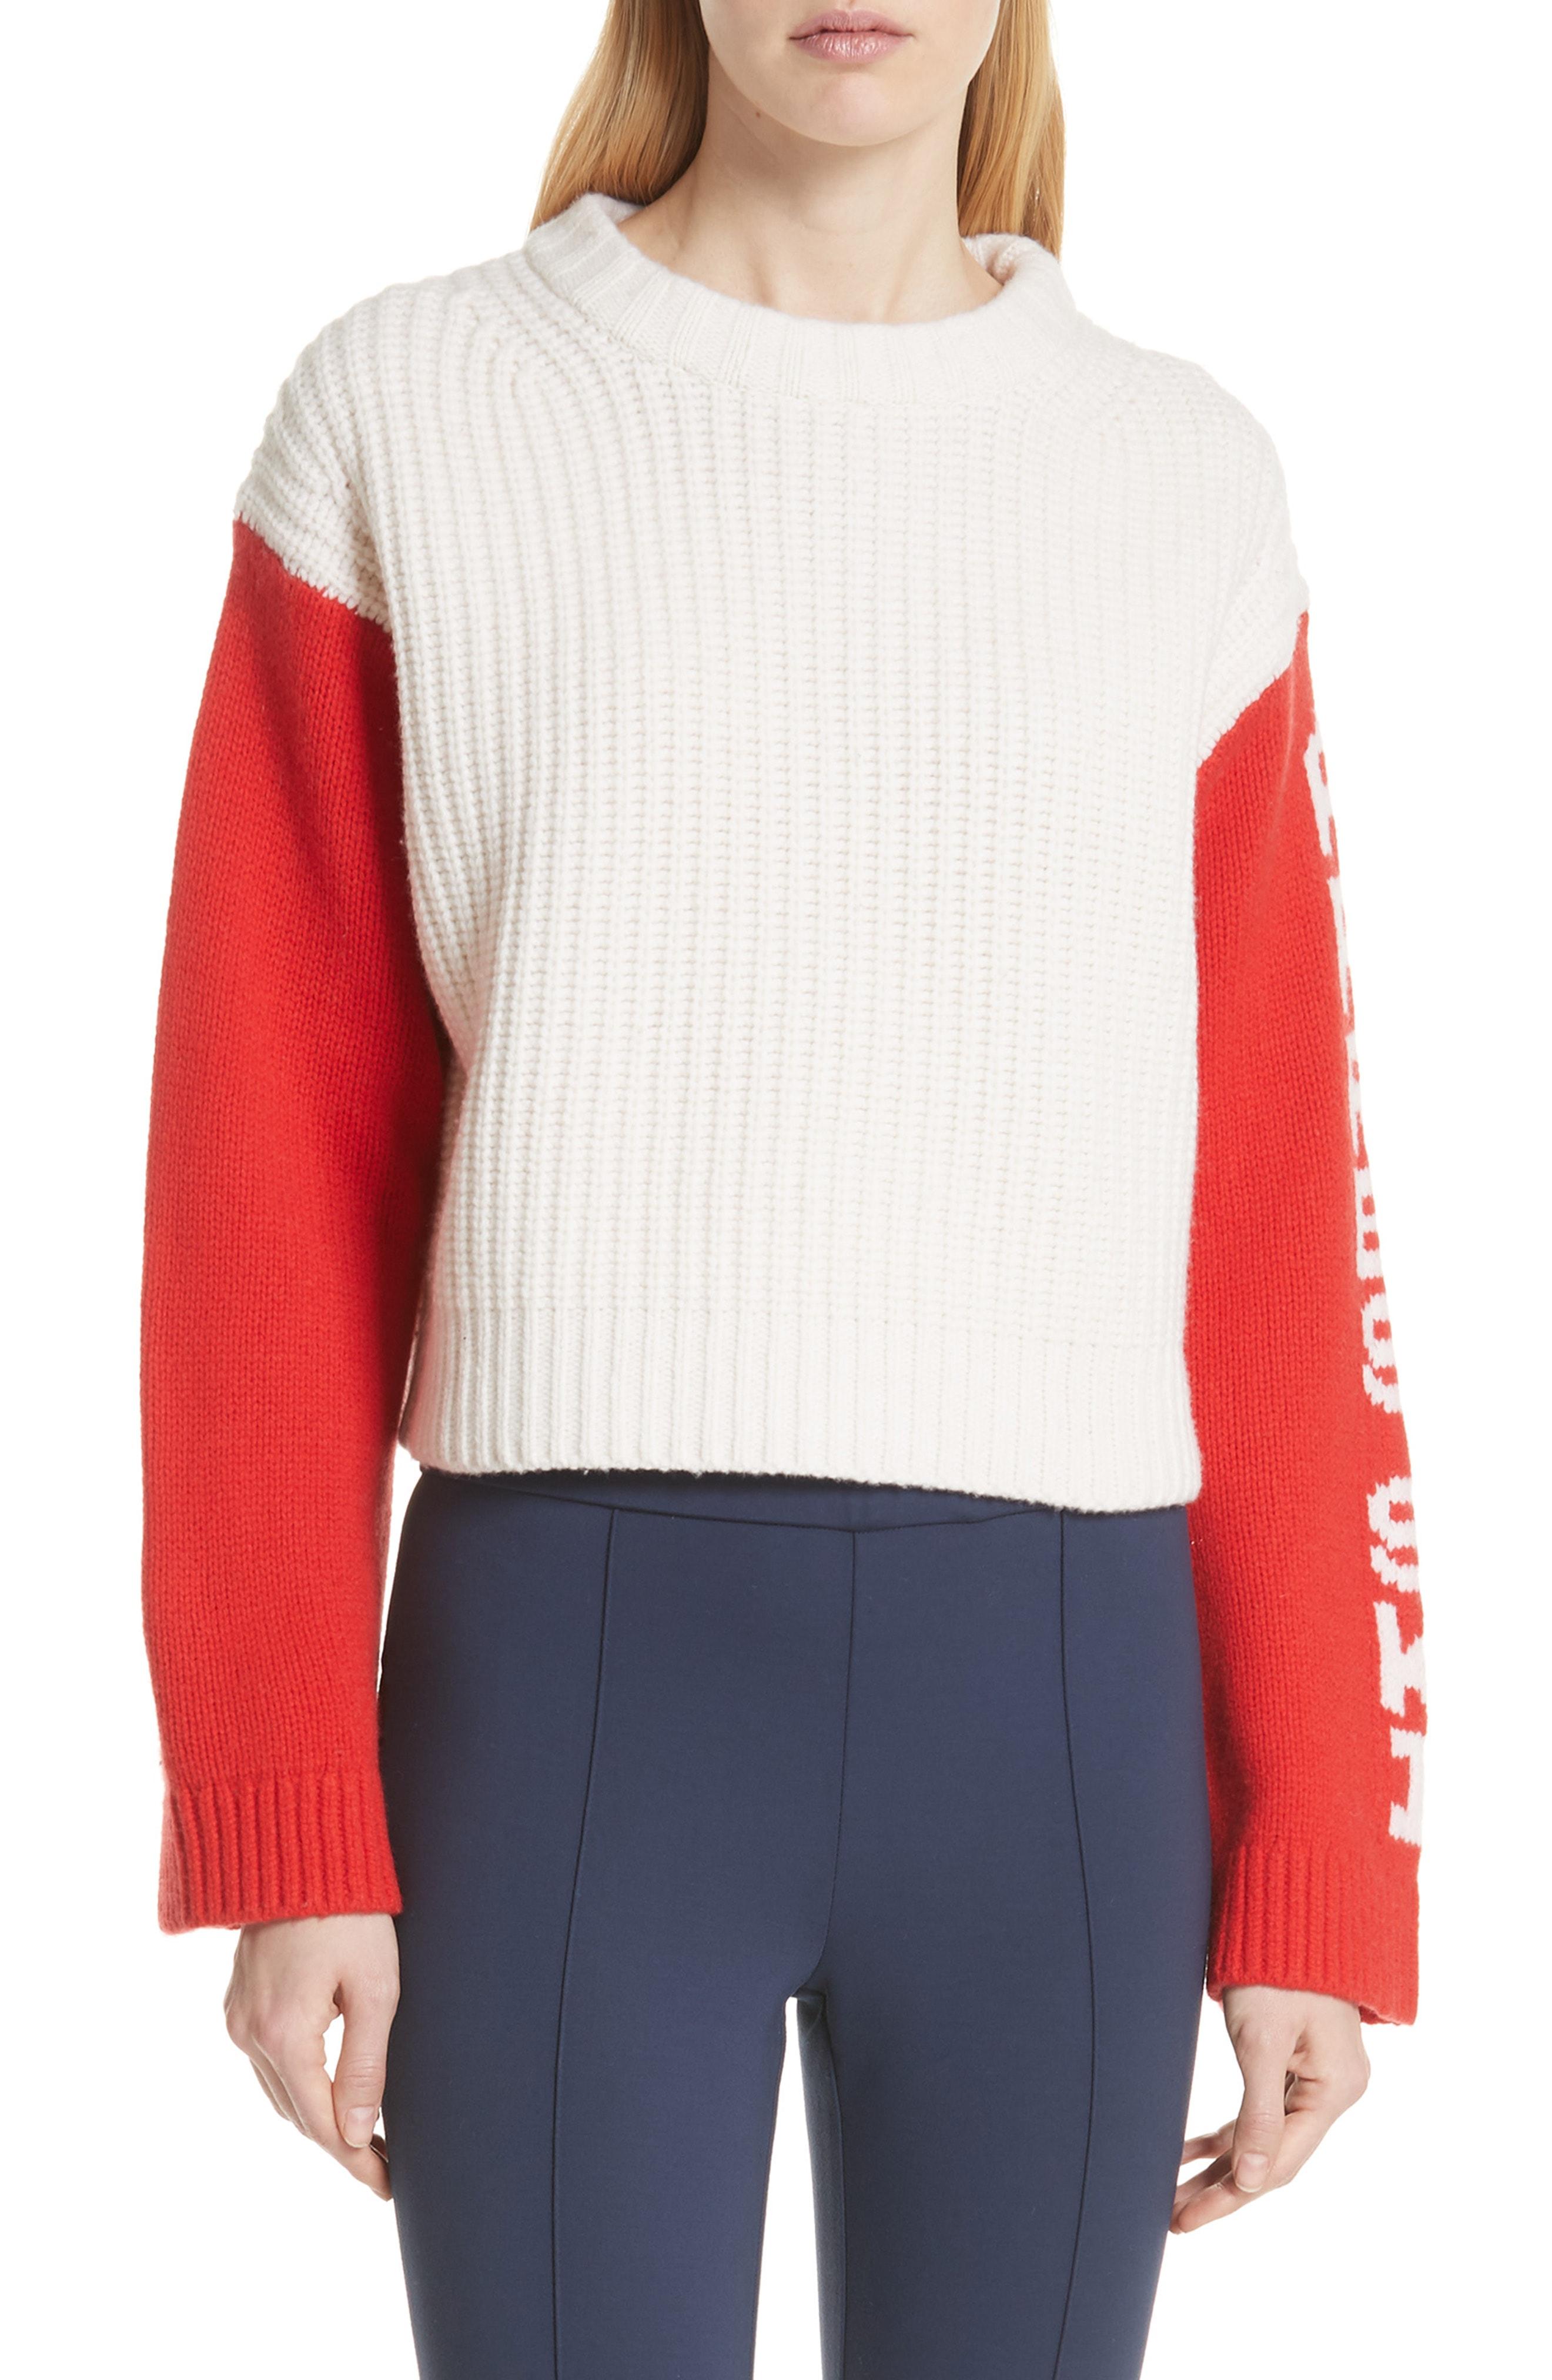 Tory Sport Crop Apres Ski Sweater